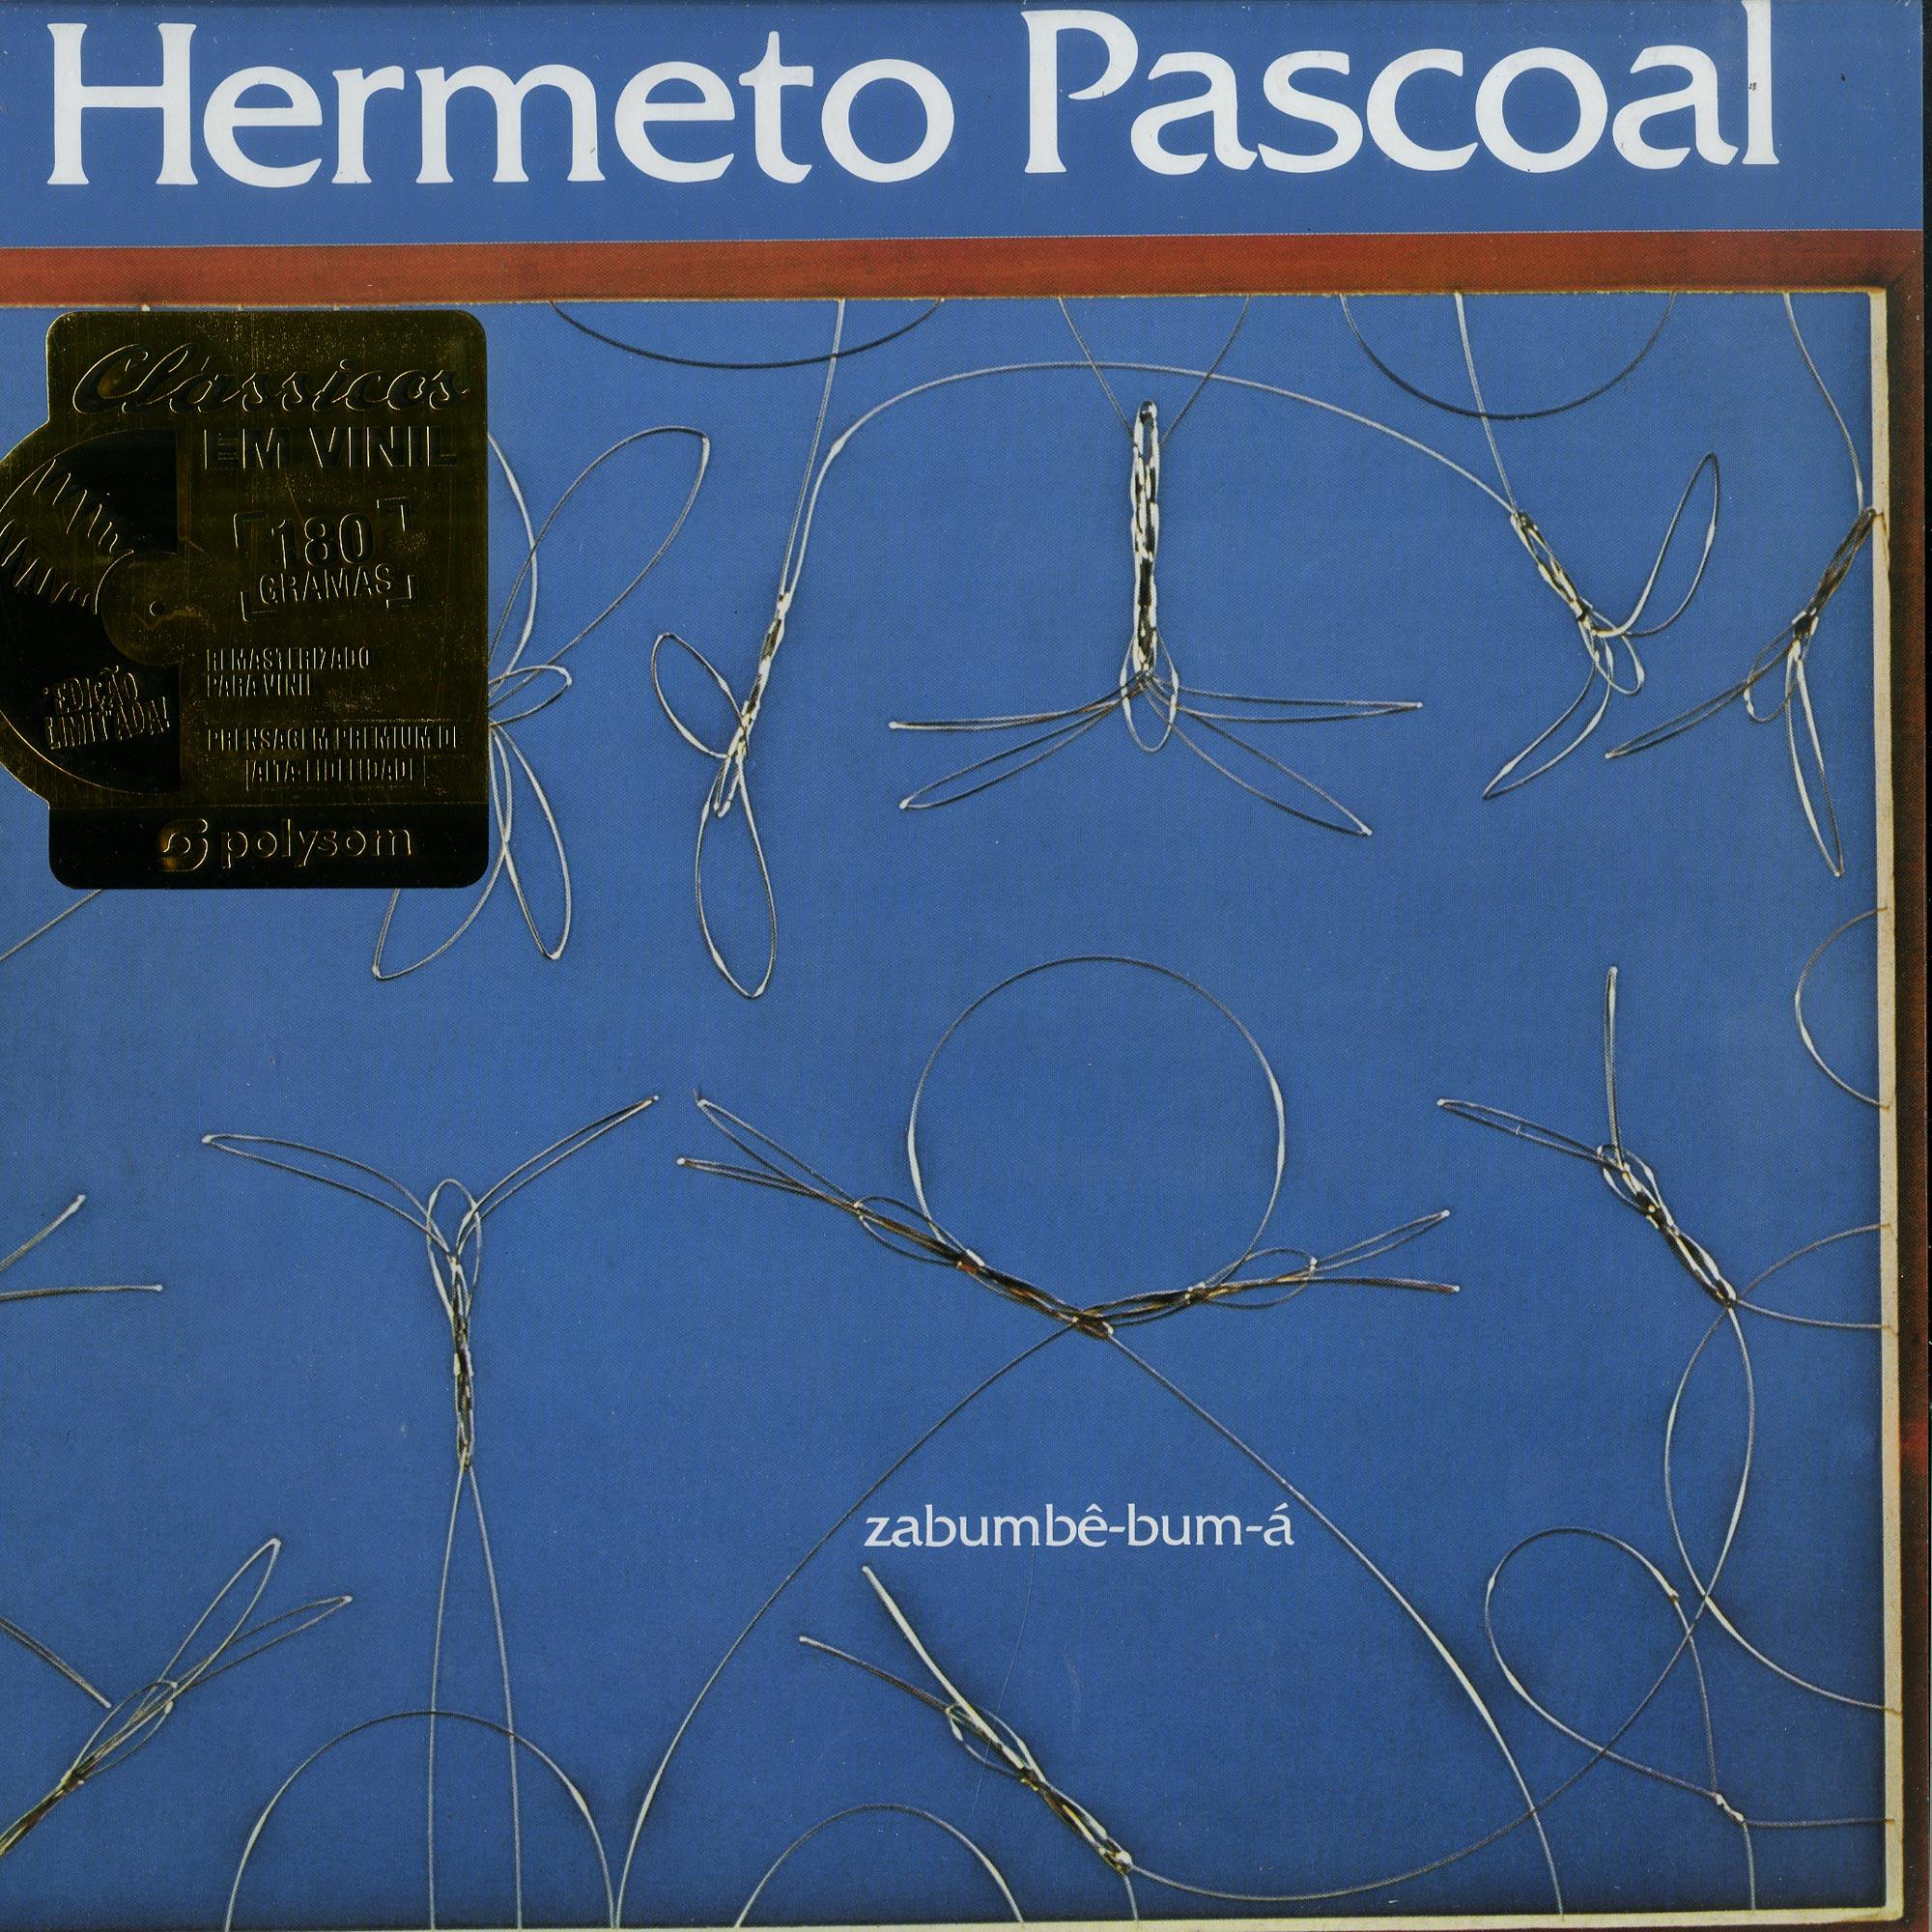 Hermeto Pascoal - ZABUMBE-BUM-A